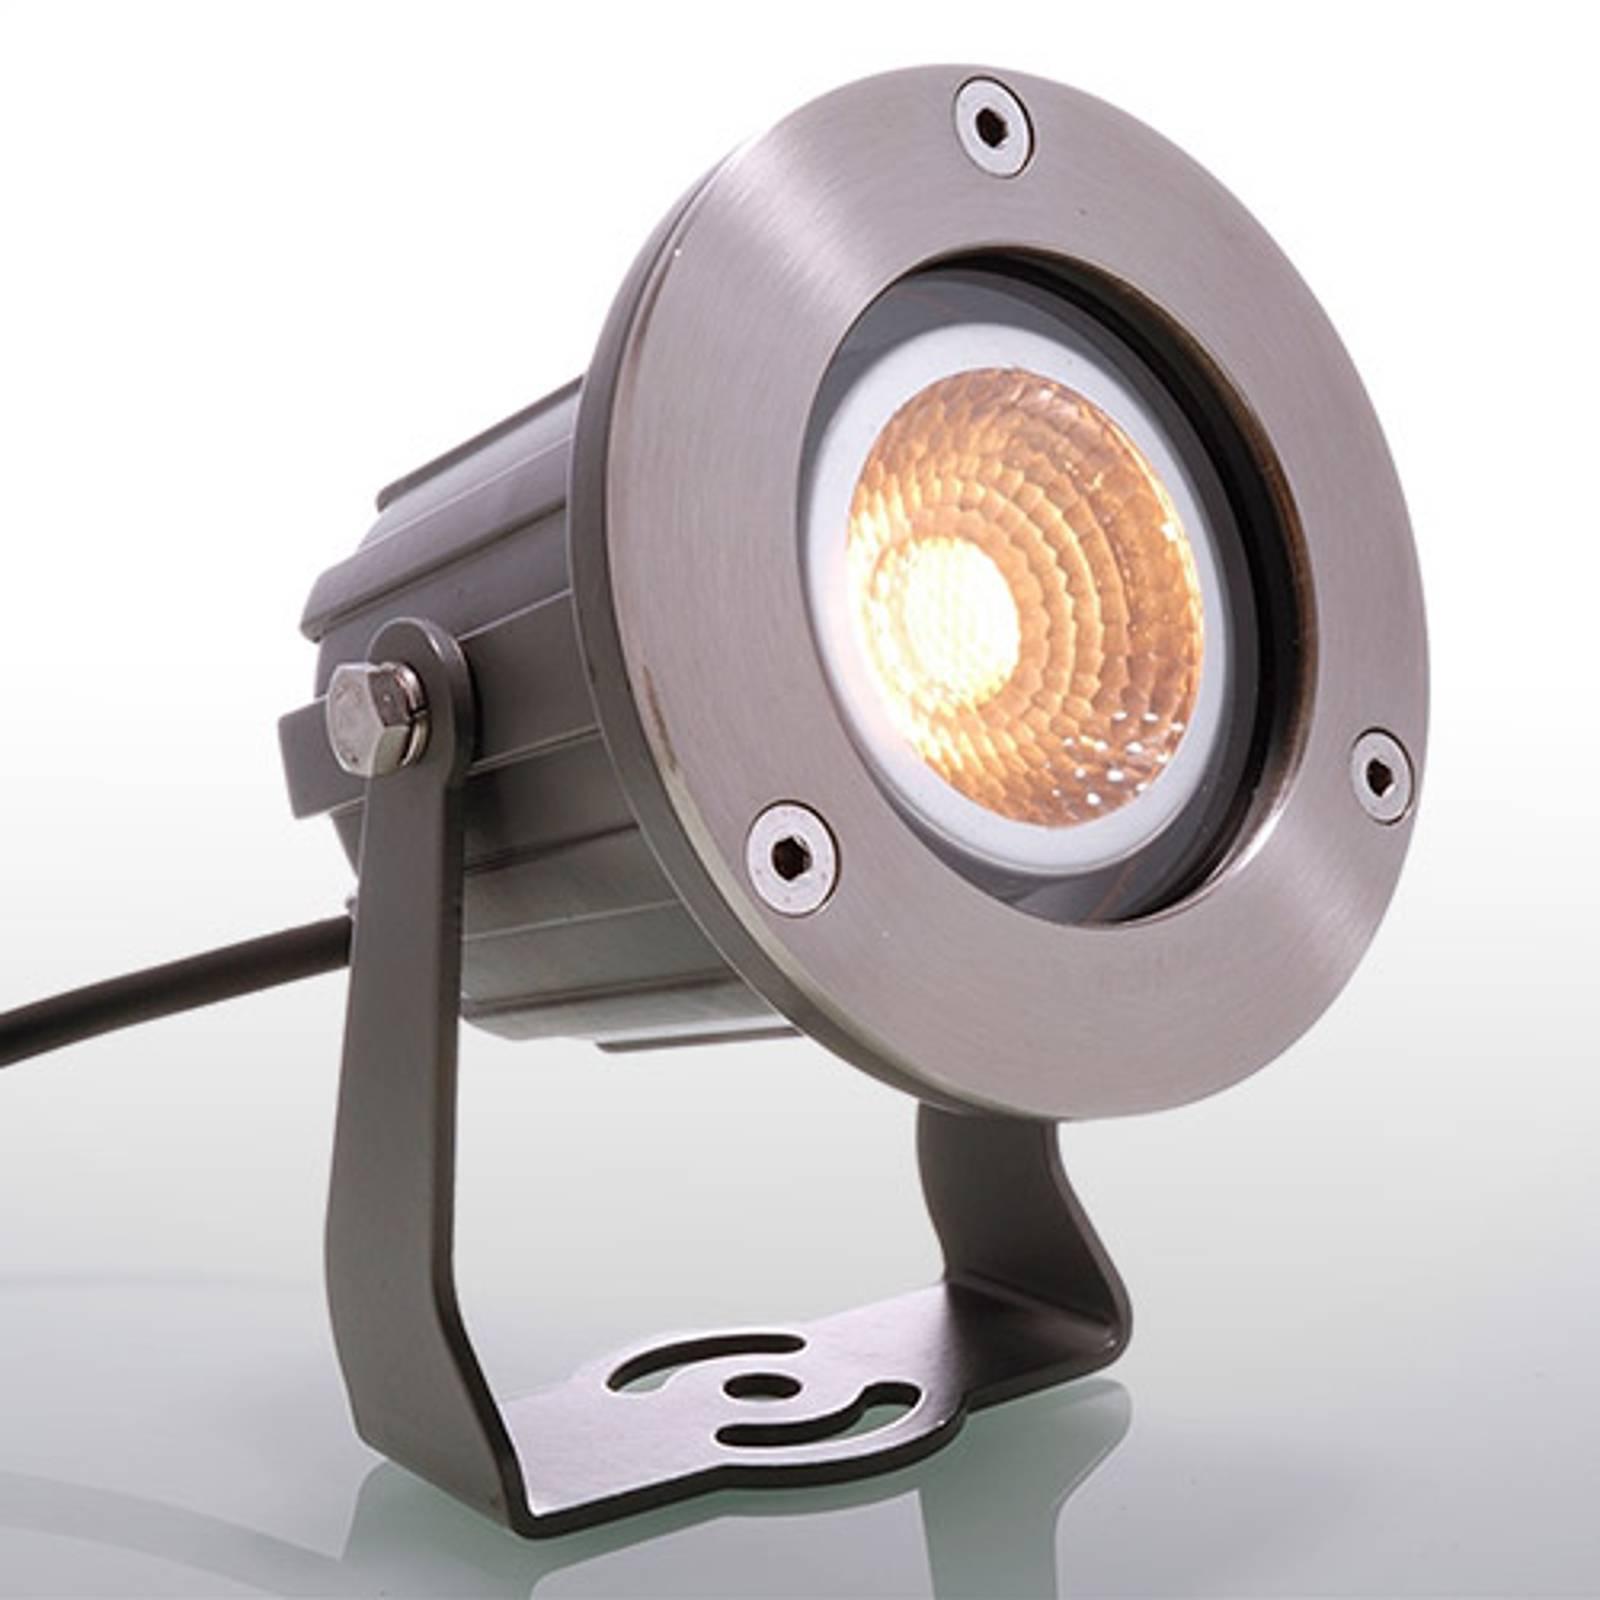 Cob Power-LED -spottivalaisin ulkokäyttöön